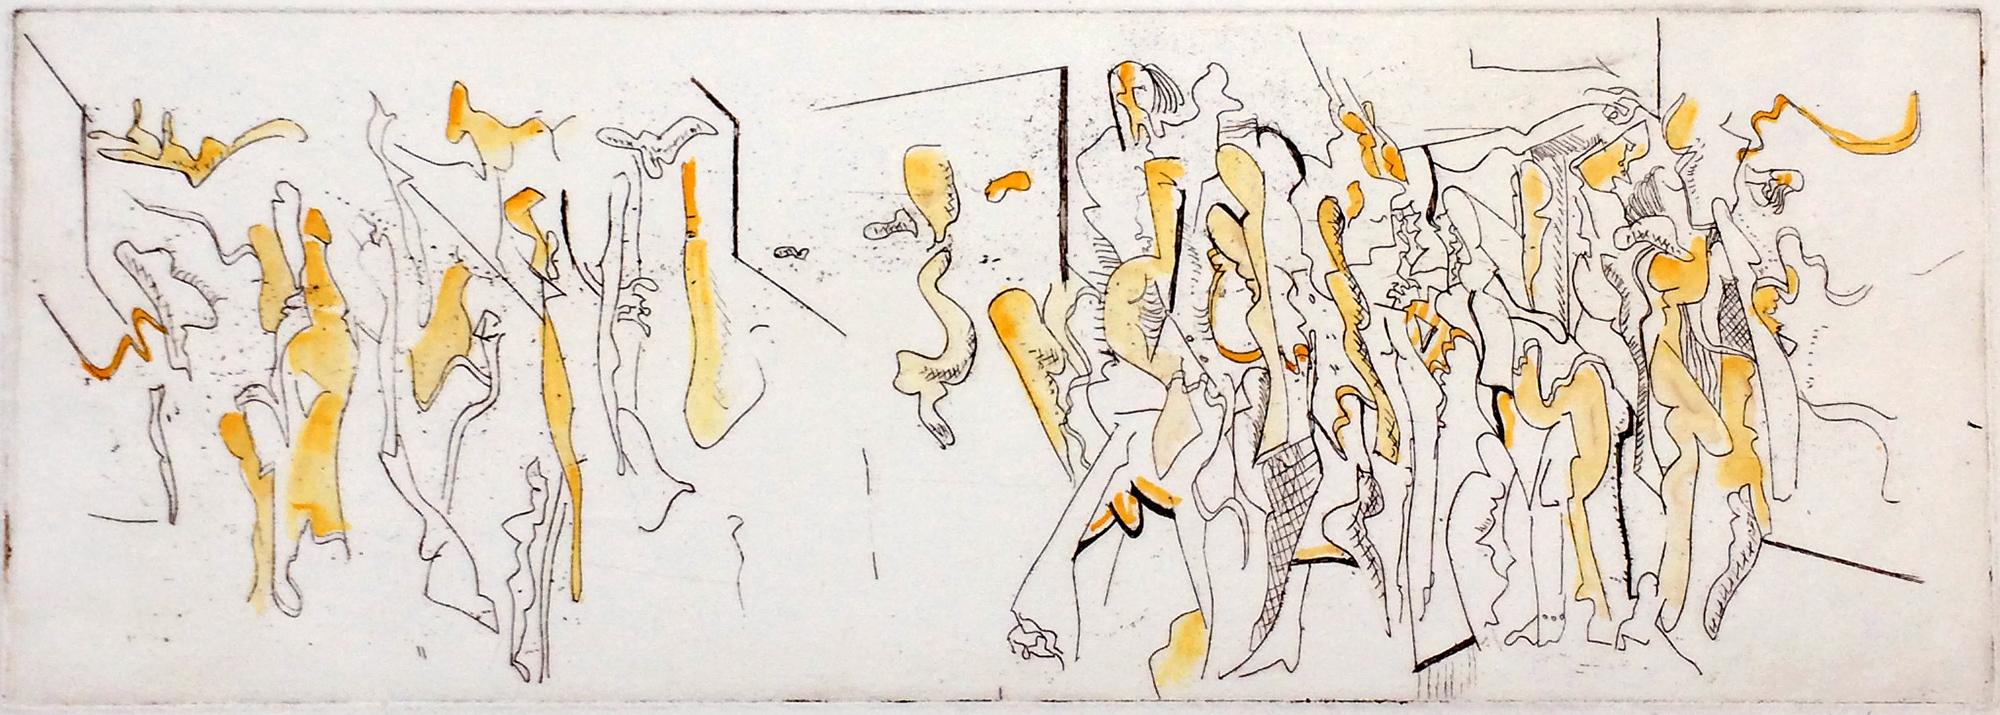 Disintegrating Group I  1967, 18 x 50.5 cm, etching